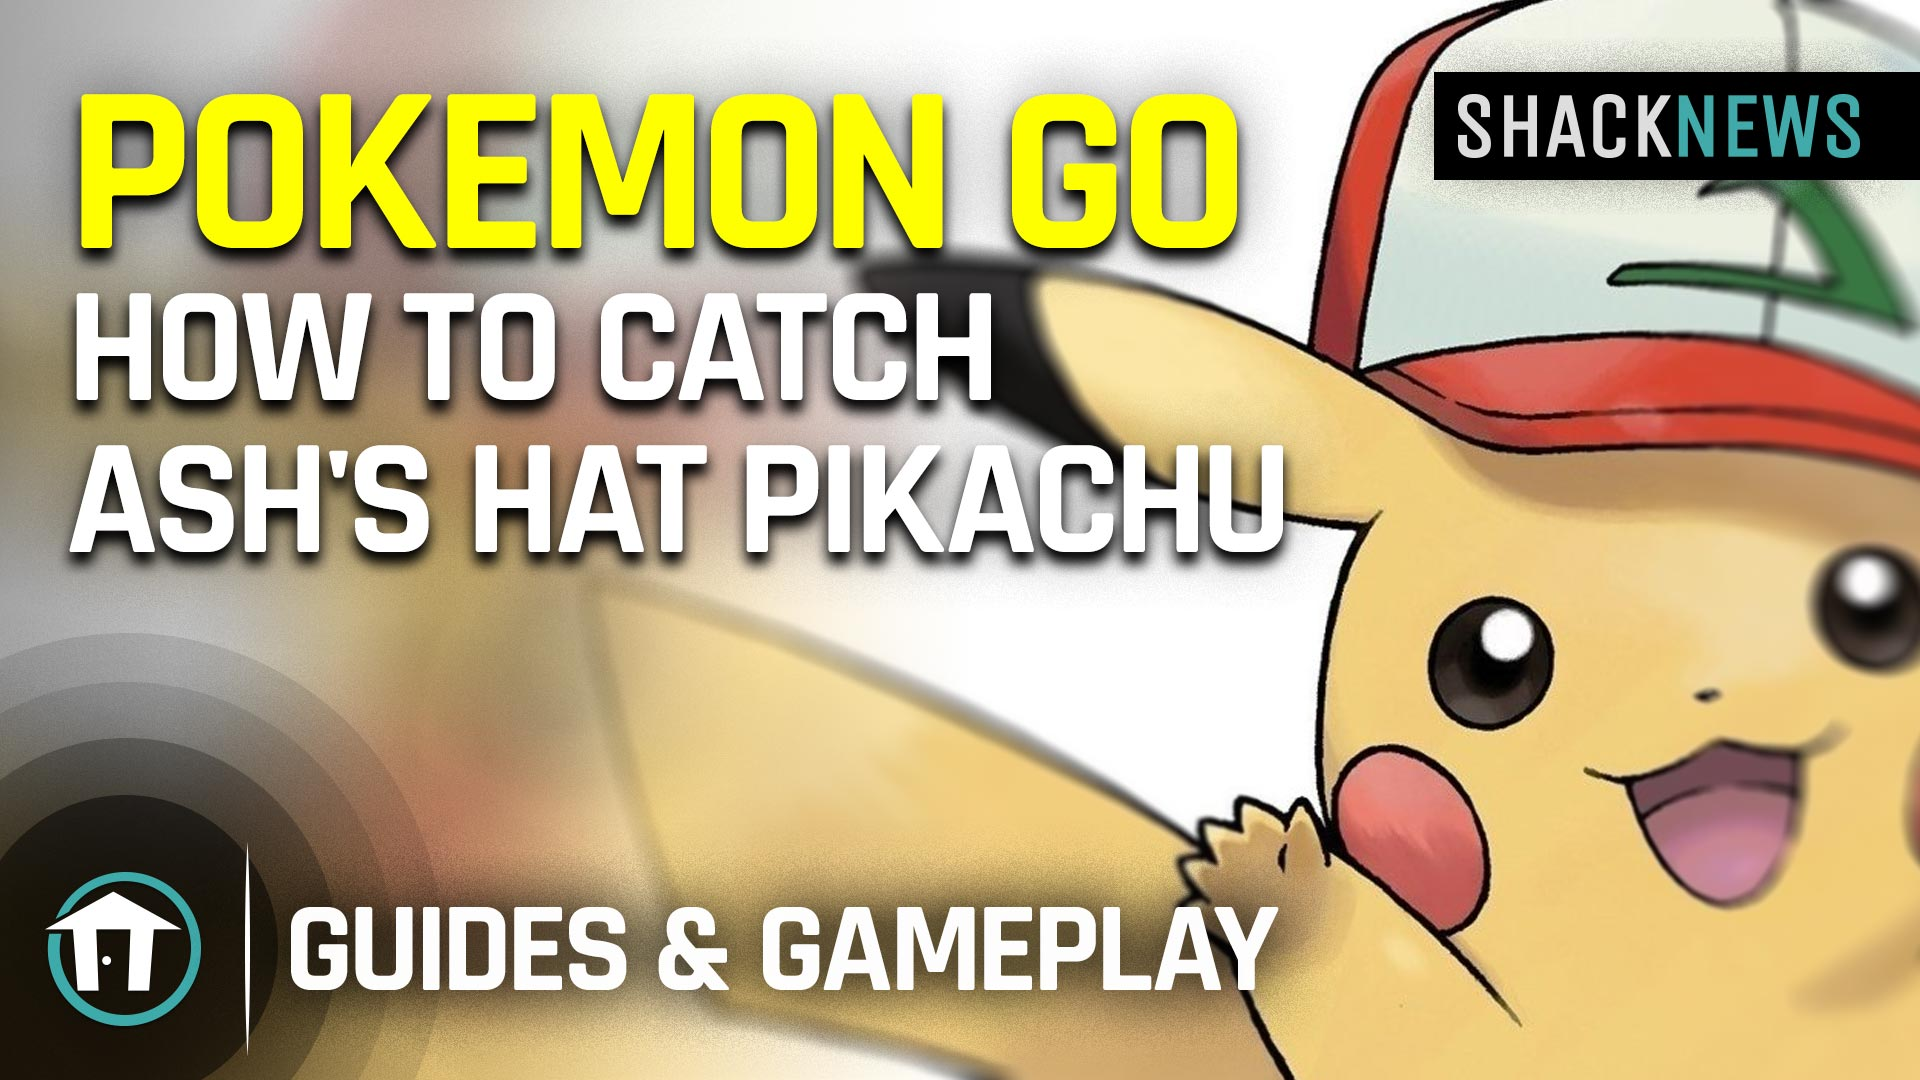 Catch Pikachu wearing Ash's hat using Pokemon Go Snapshot